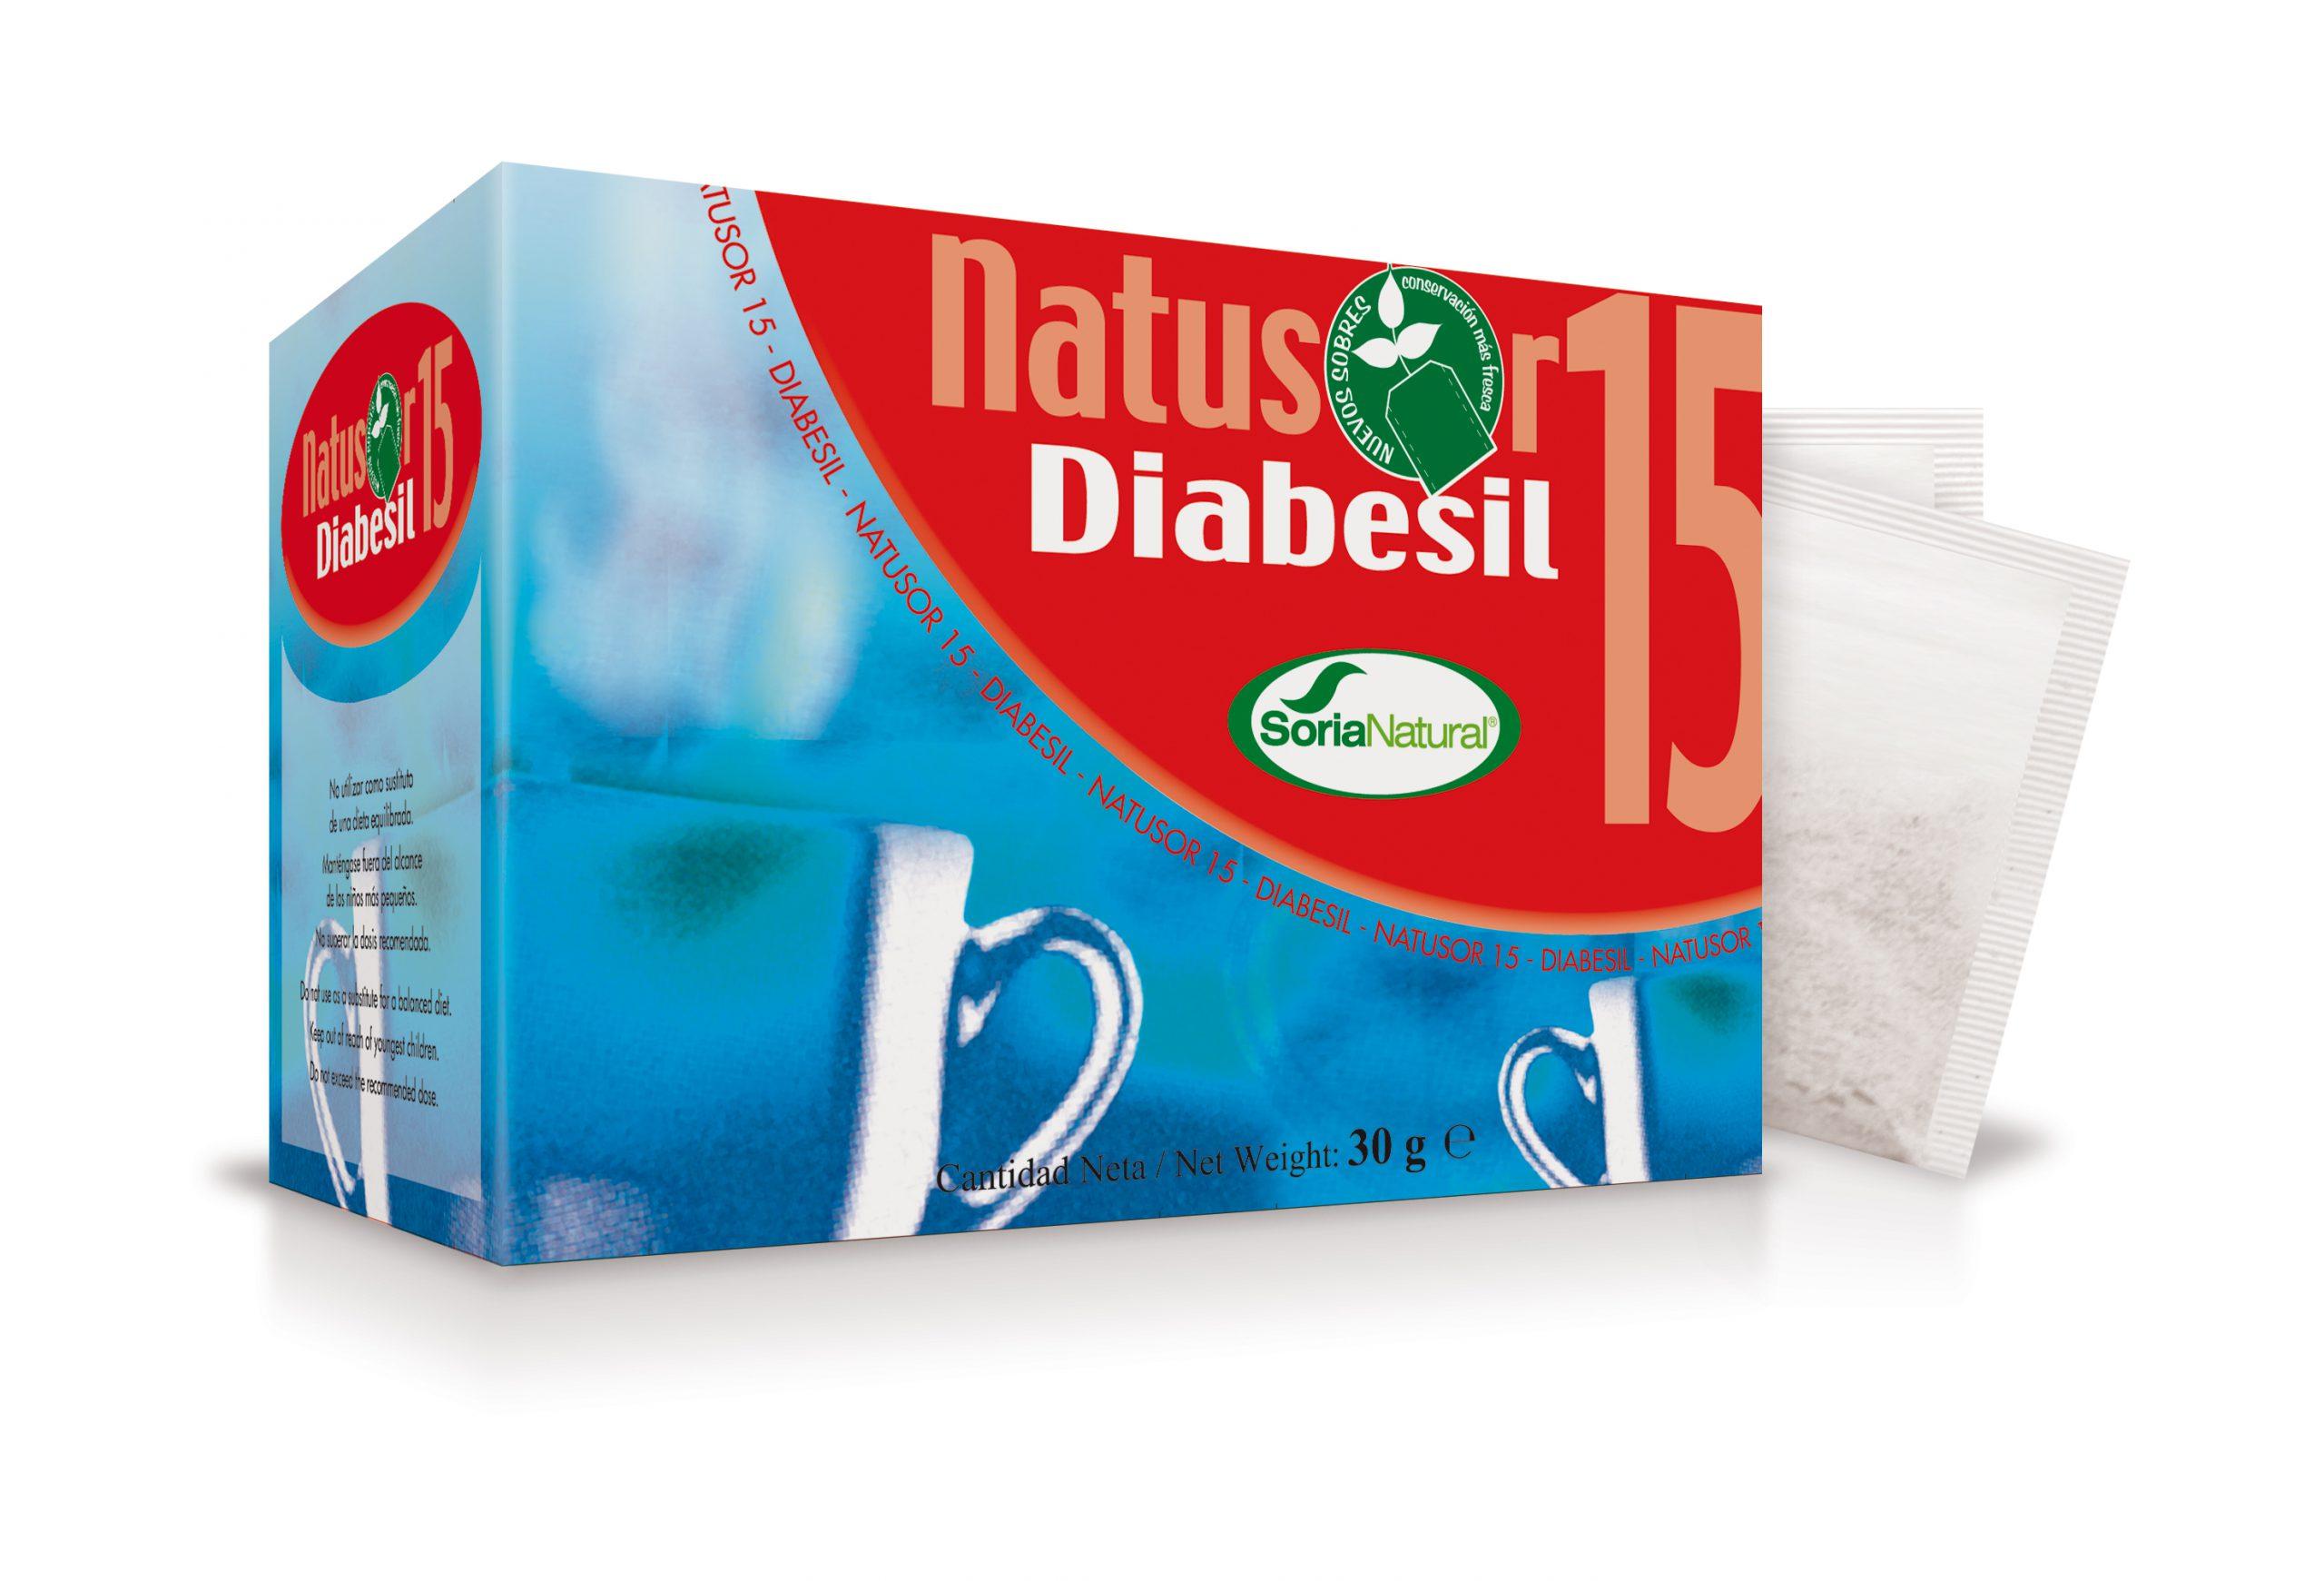 Natusor 15 Diabesil